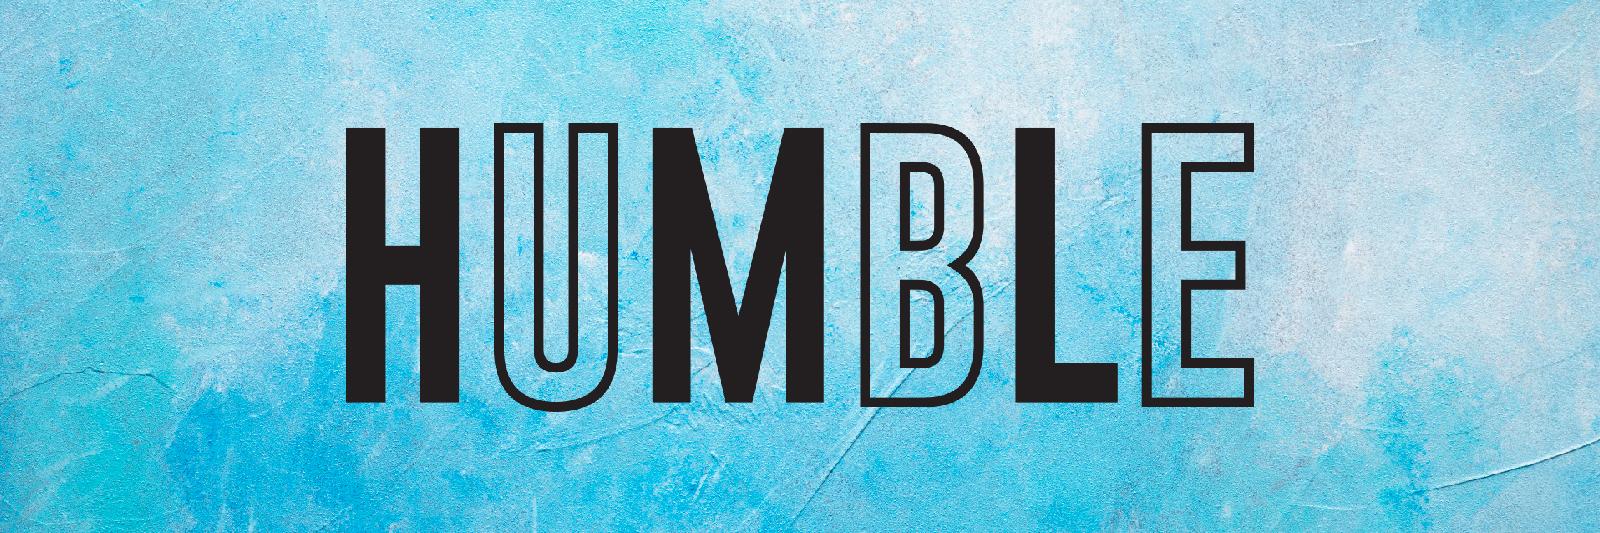 Humble_Web_HomePg_1500x500.jpg